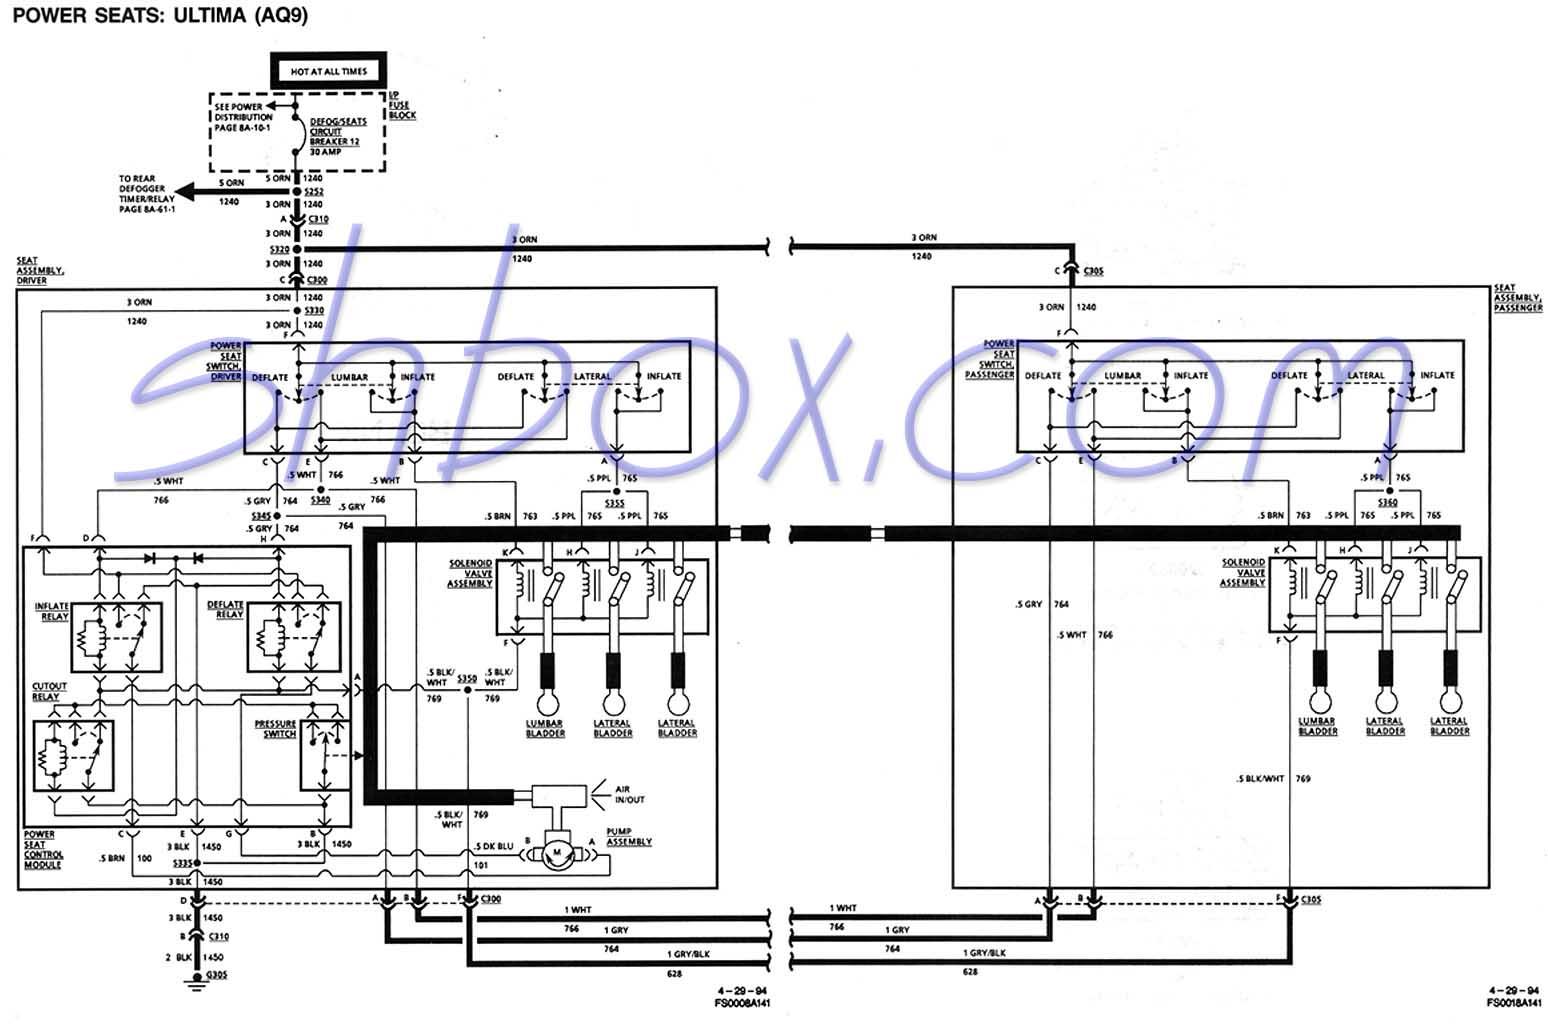 1995 pontiac firebird wiring diagram auto electrical wiring diagram 1995  dodge dakota wiring diagram 1995 pontiac